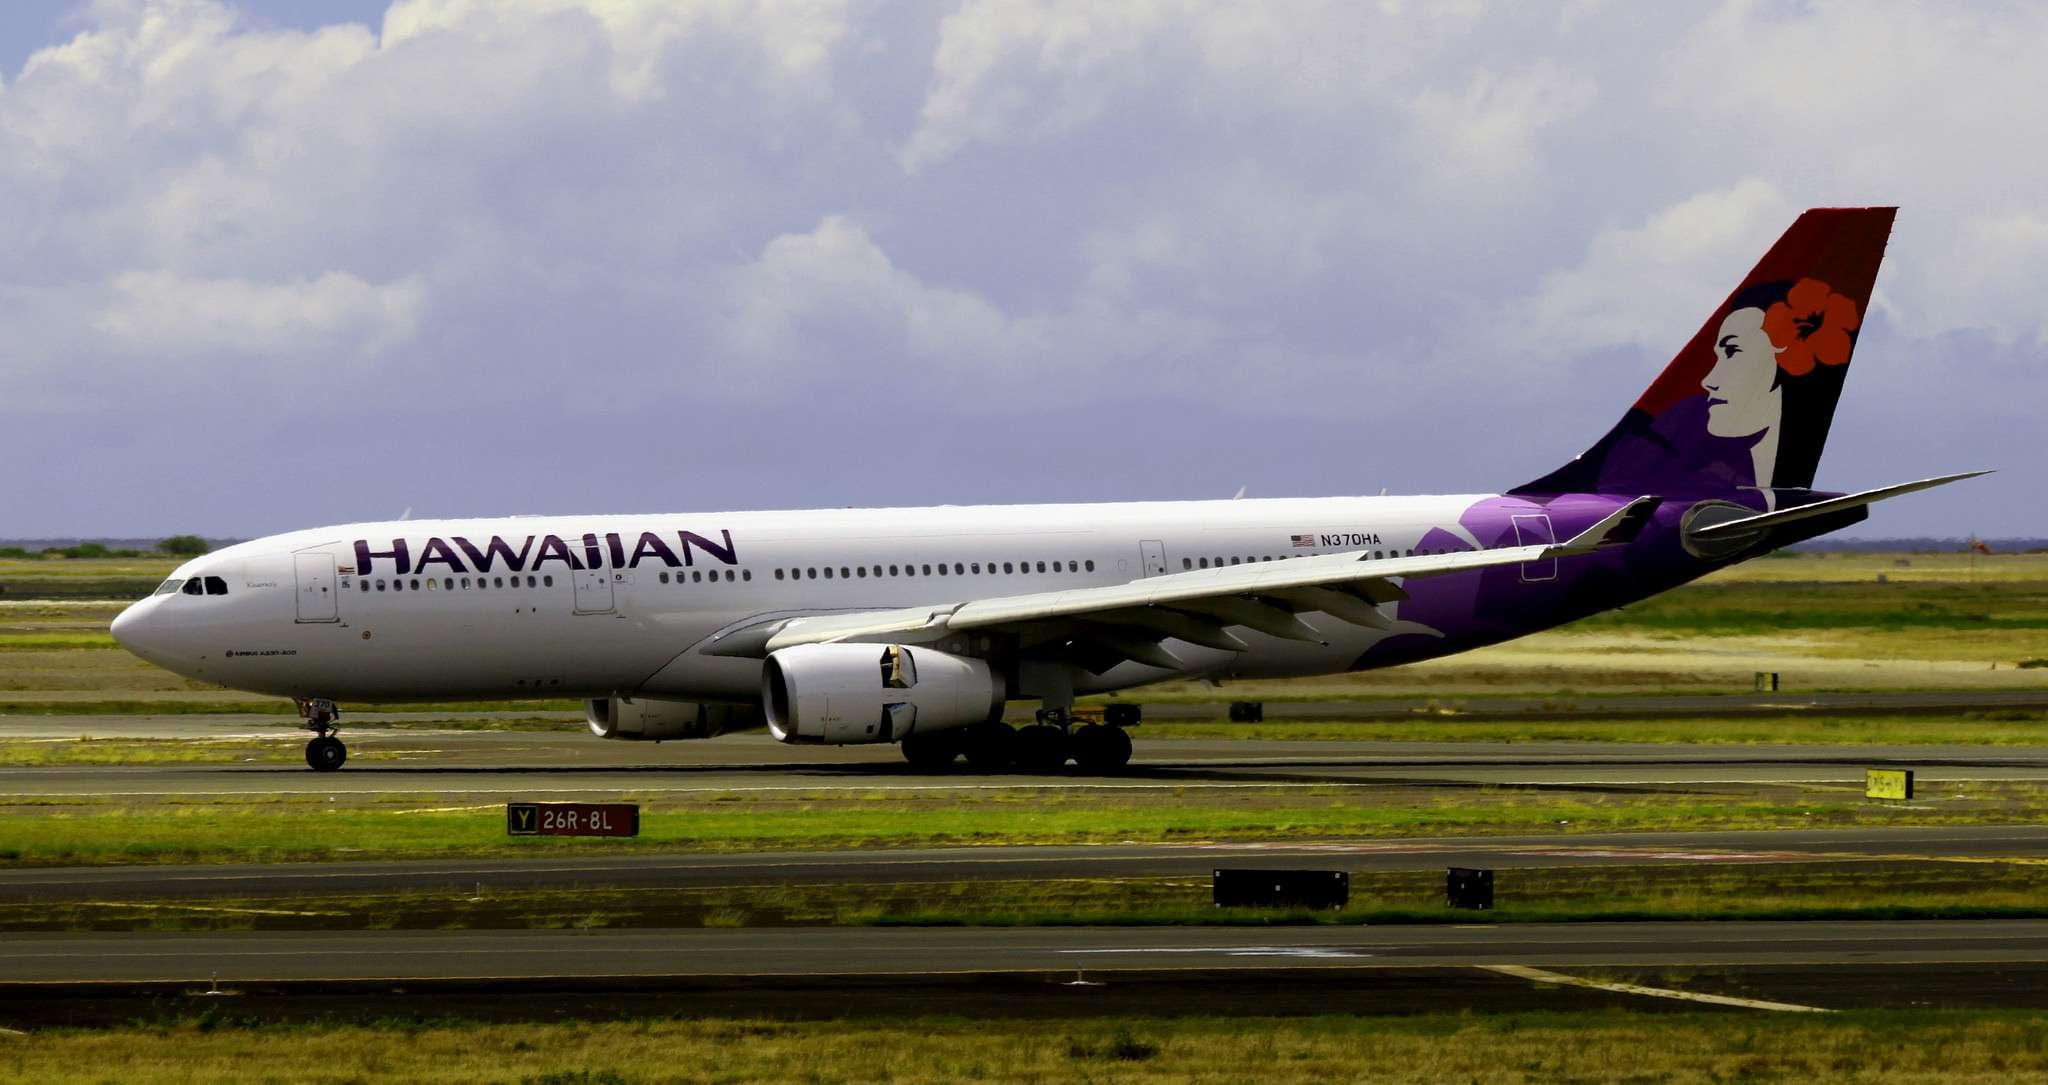 Hawaiian Airlines plane on tarmac